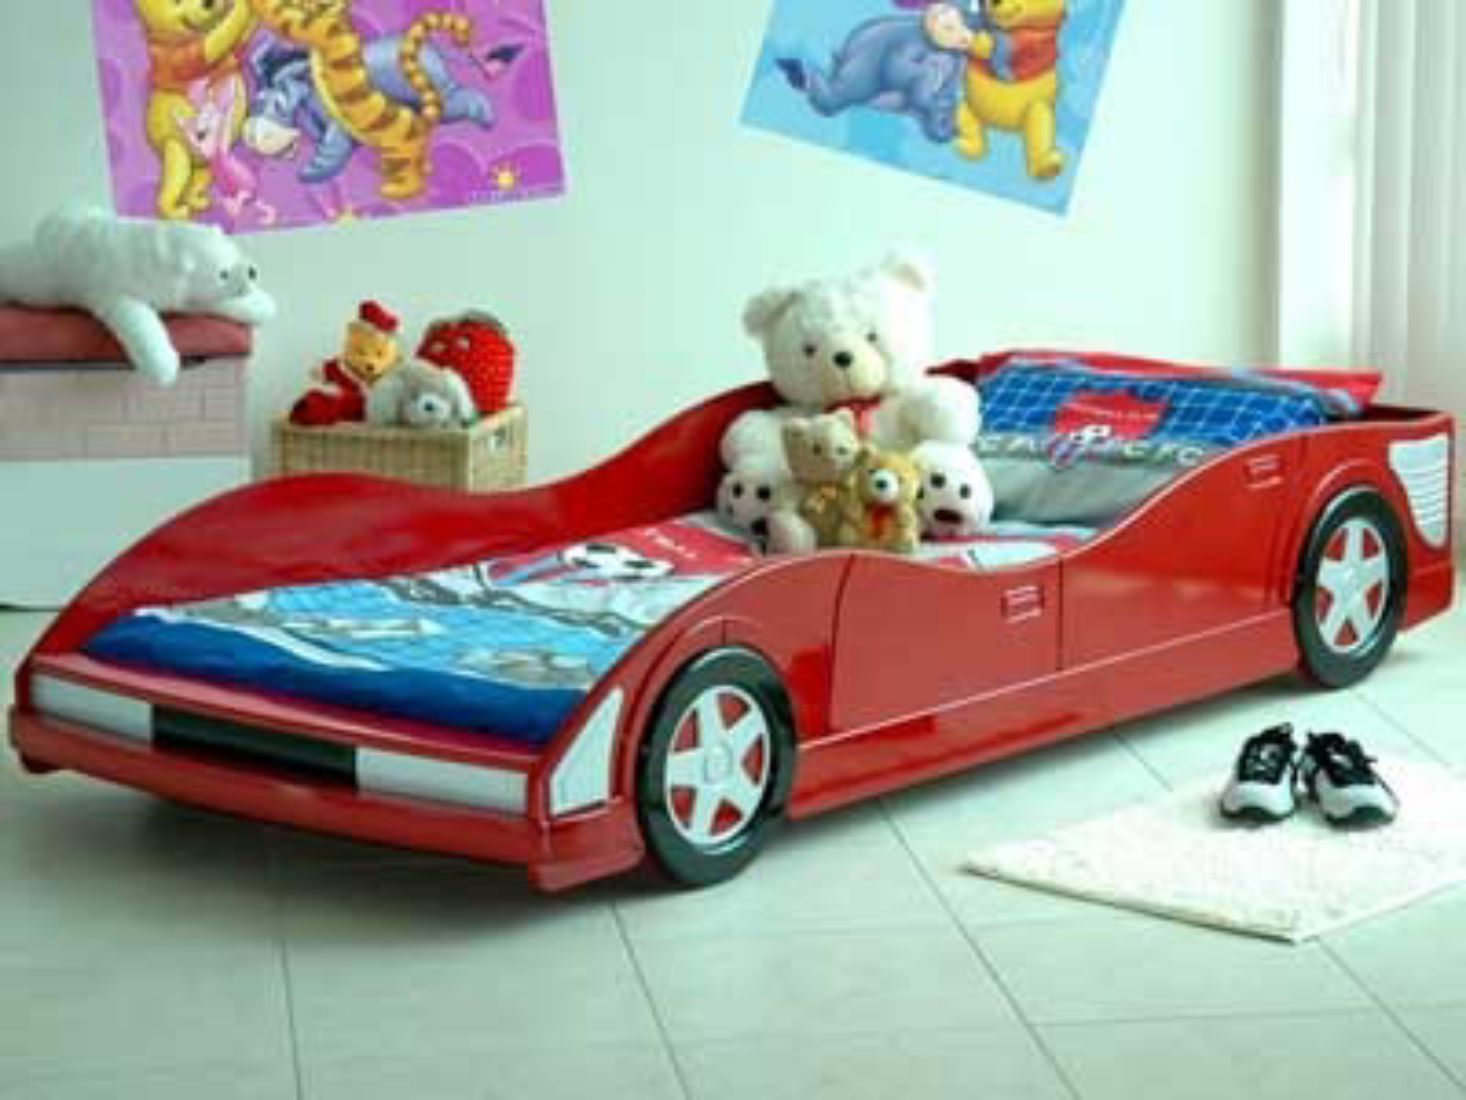 Harmony Michael Racing Car Bed 190 90 Cm 6u00273 X 3u0027